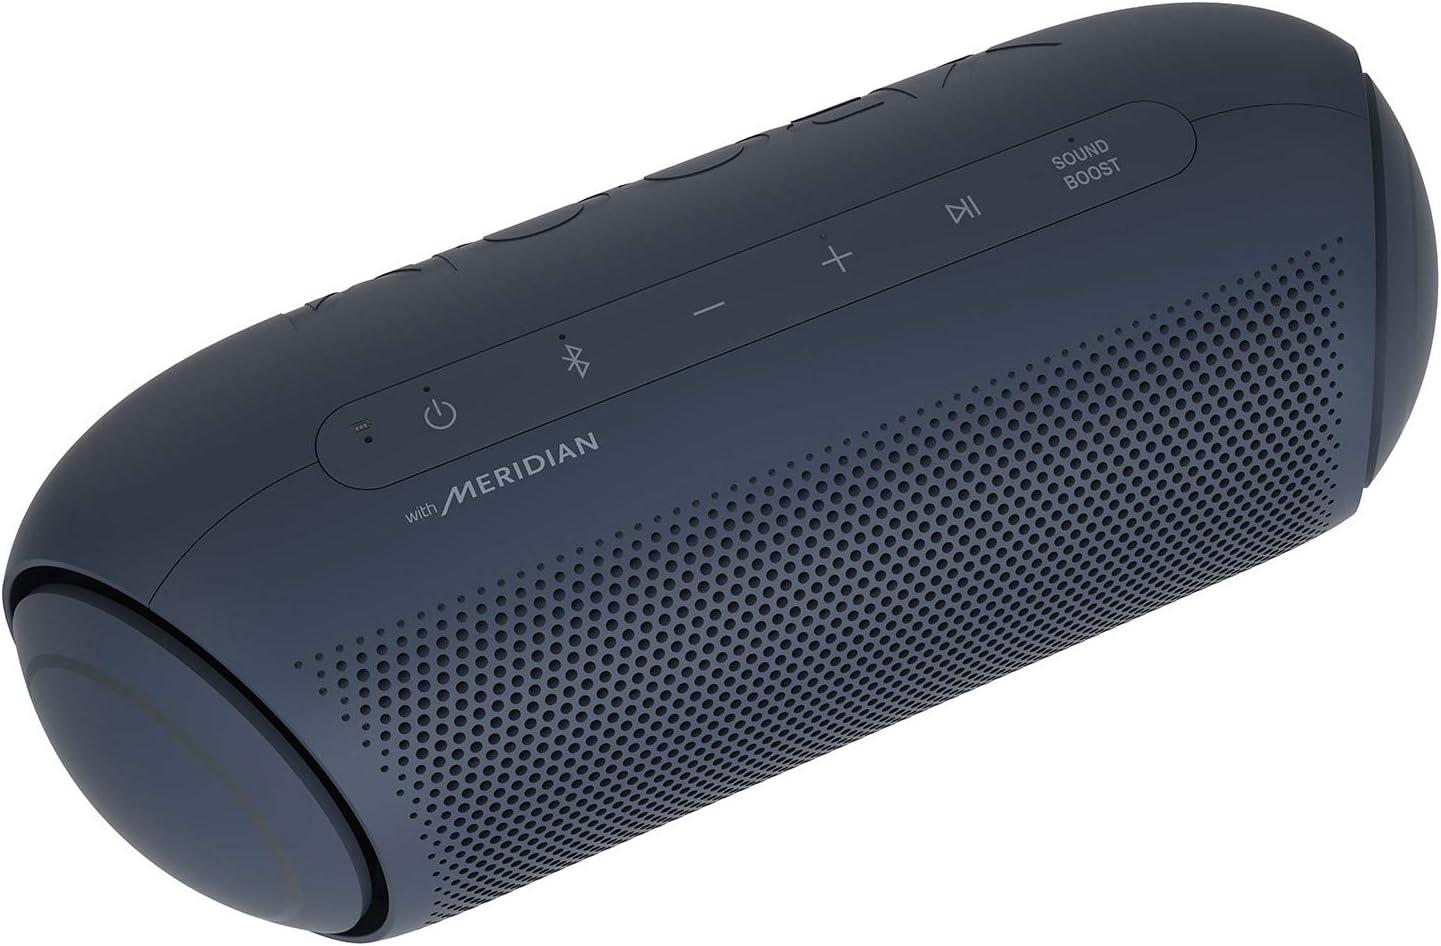 Enceinte Bluetooth LG Electronics PL7